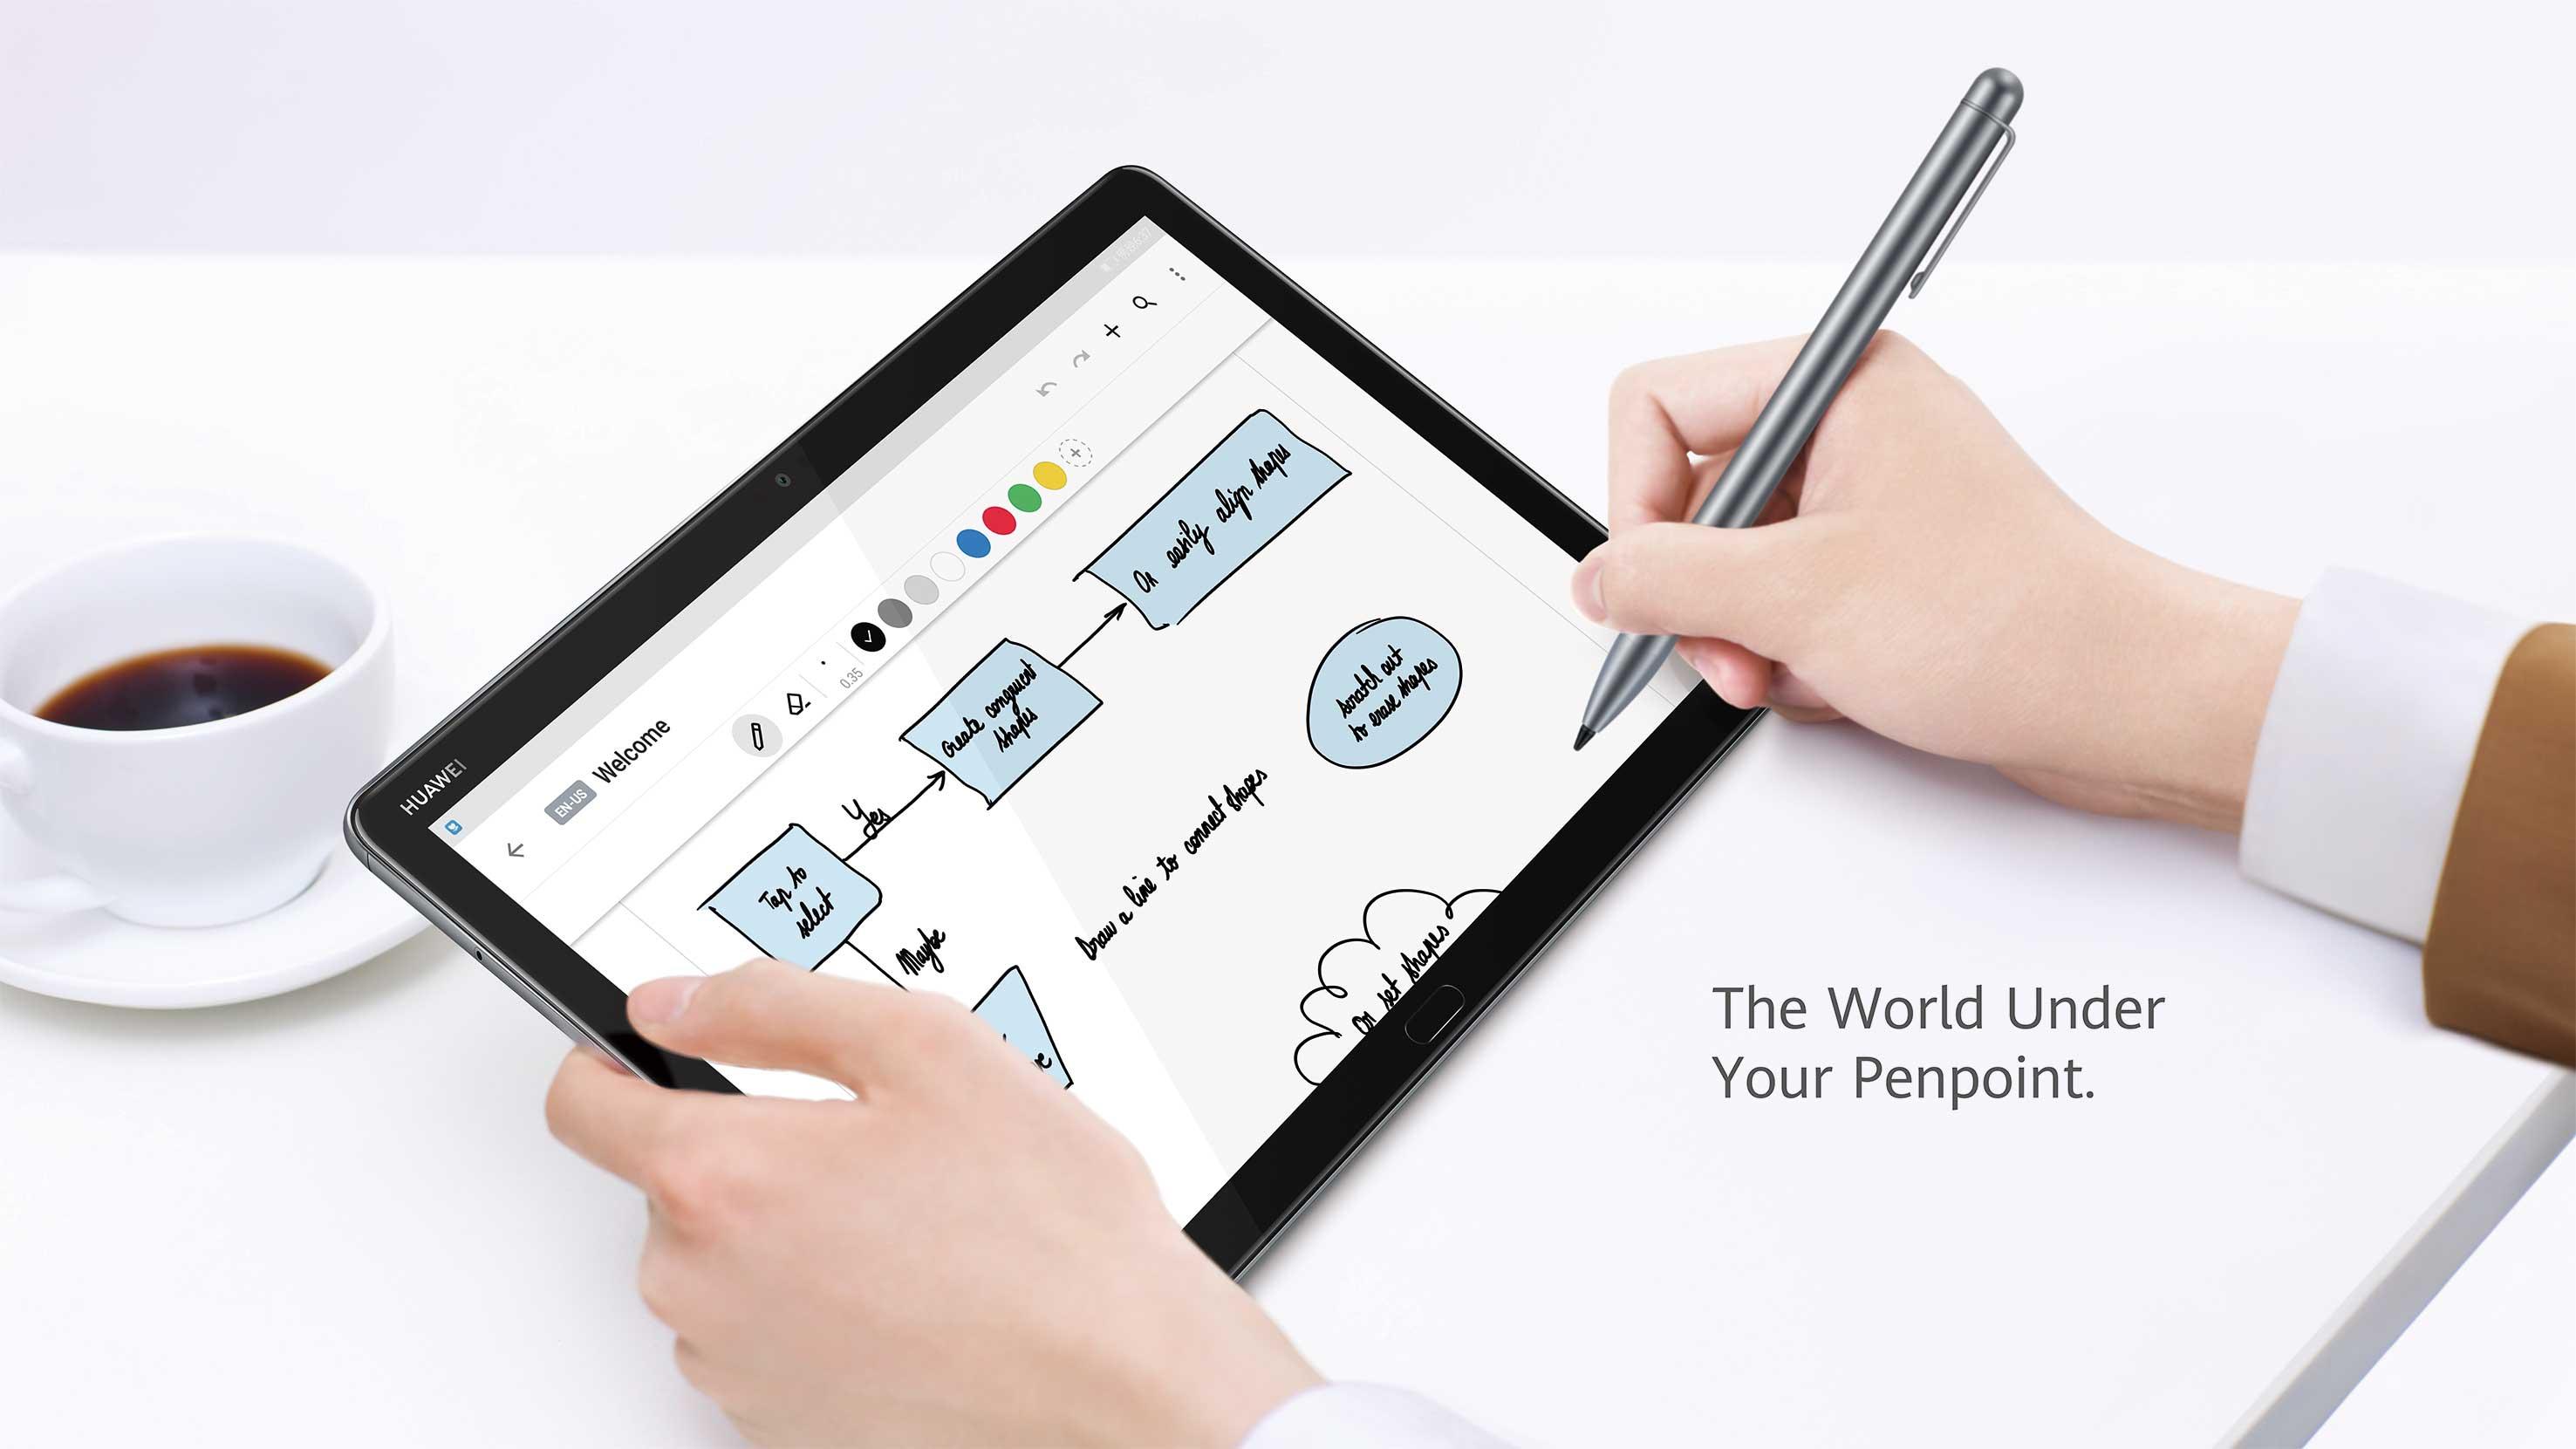 Huawei mediapad m5 lite showing m-pen functions